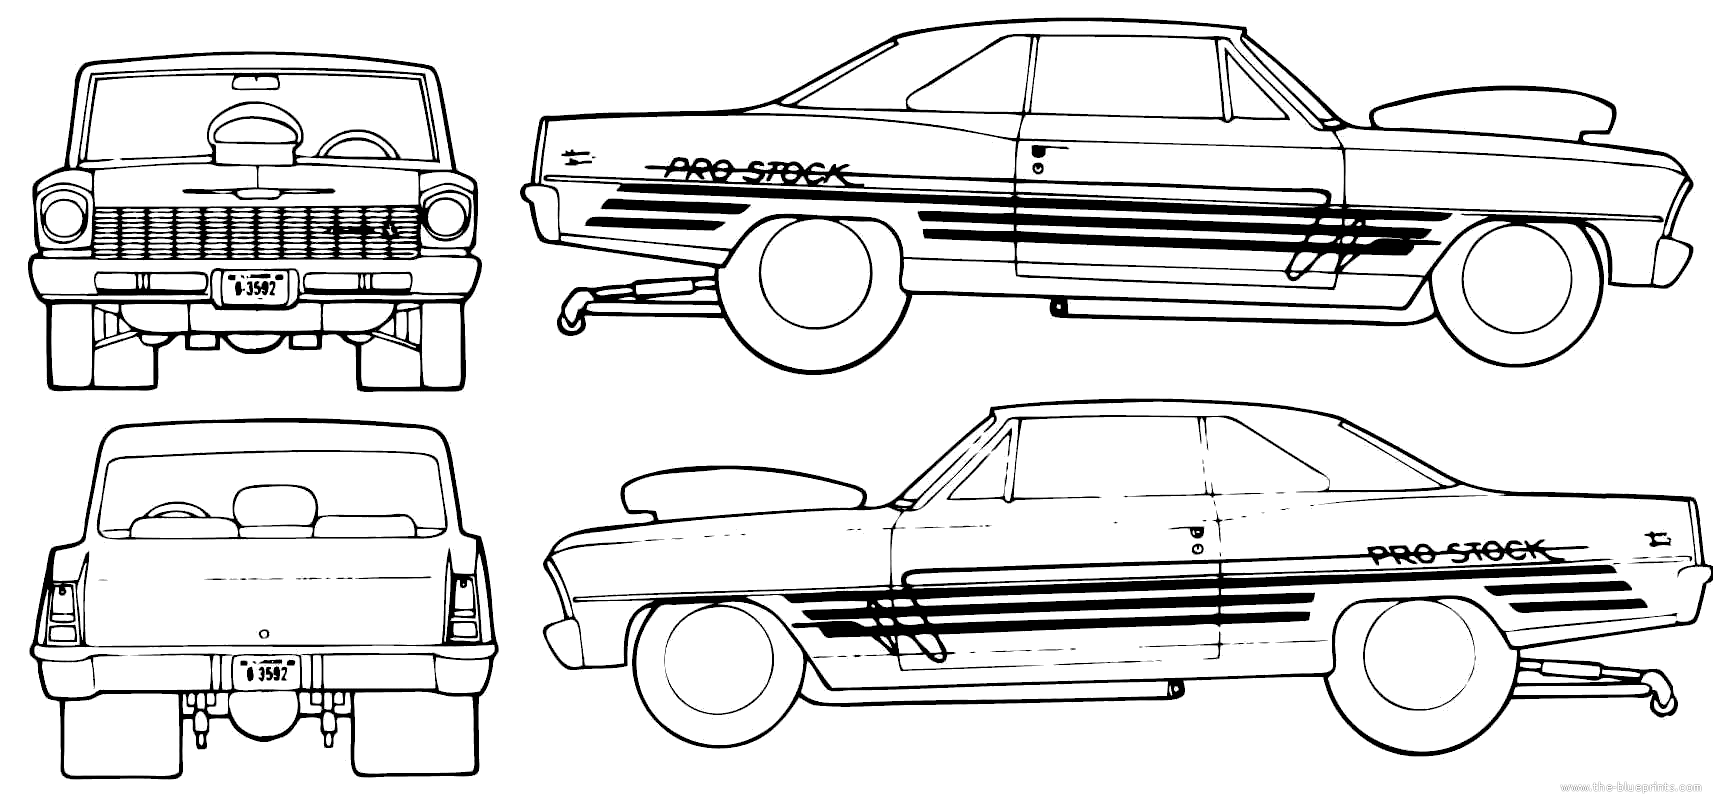 The Blueprints Blueprints Depot Cars Chevrolet